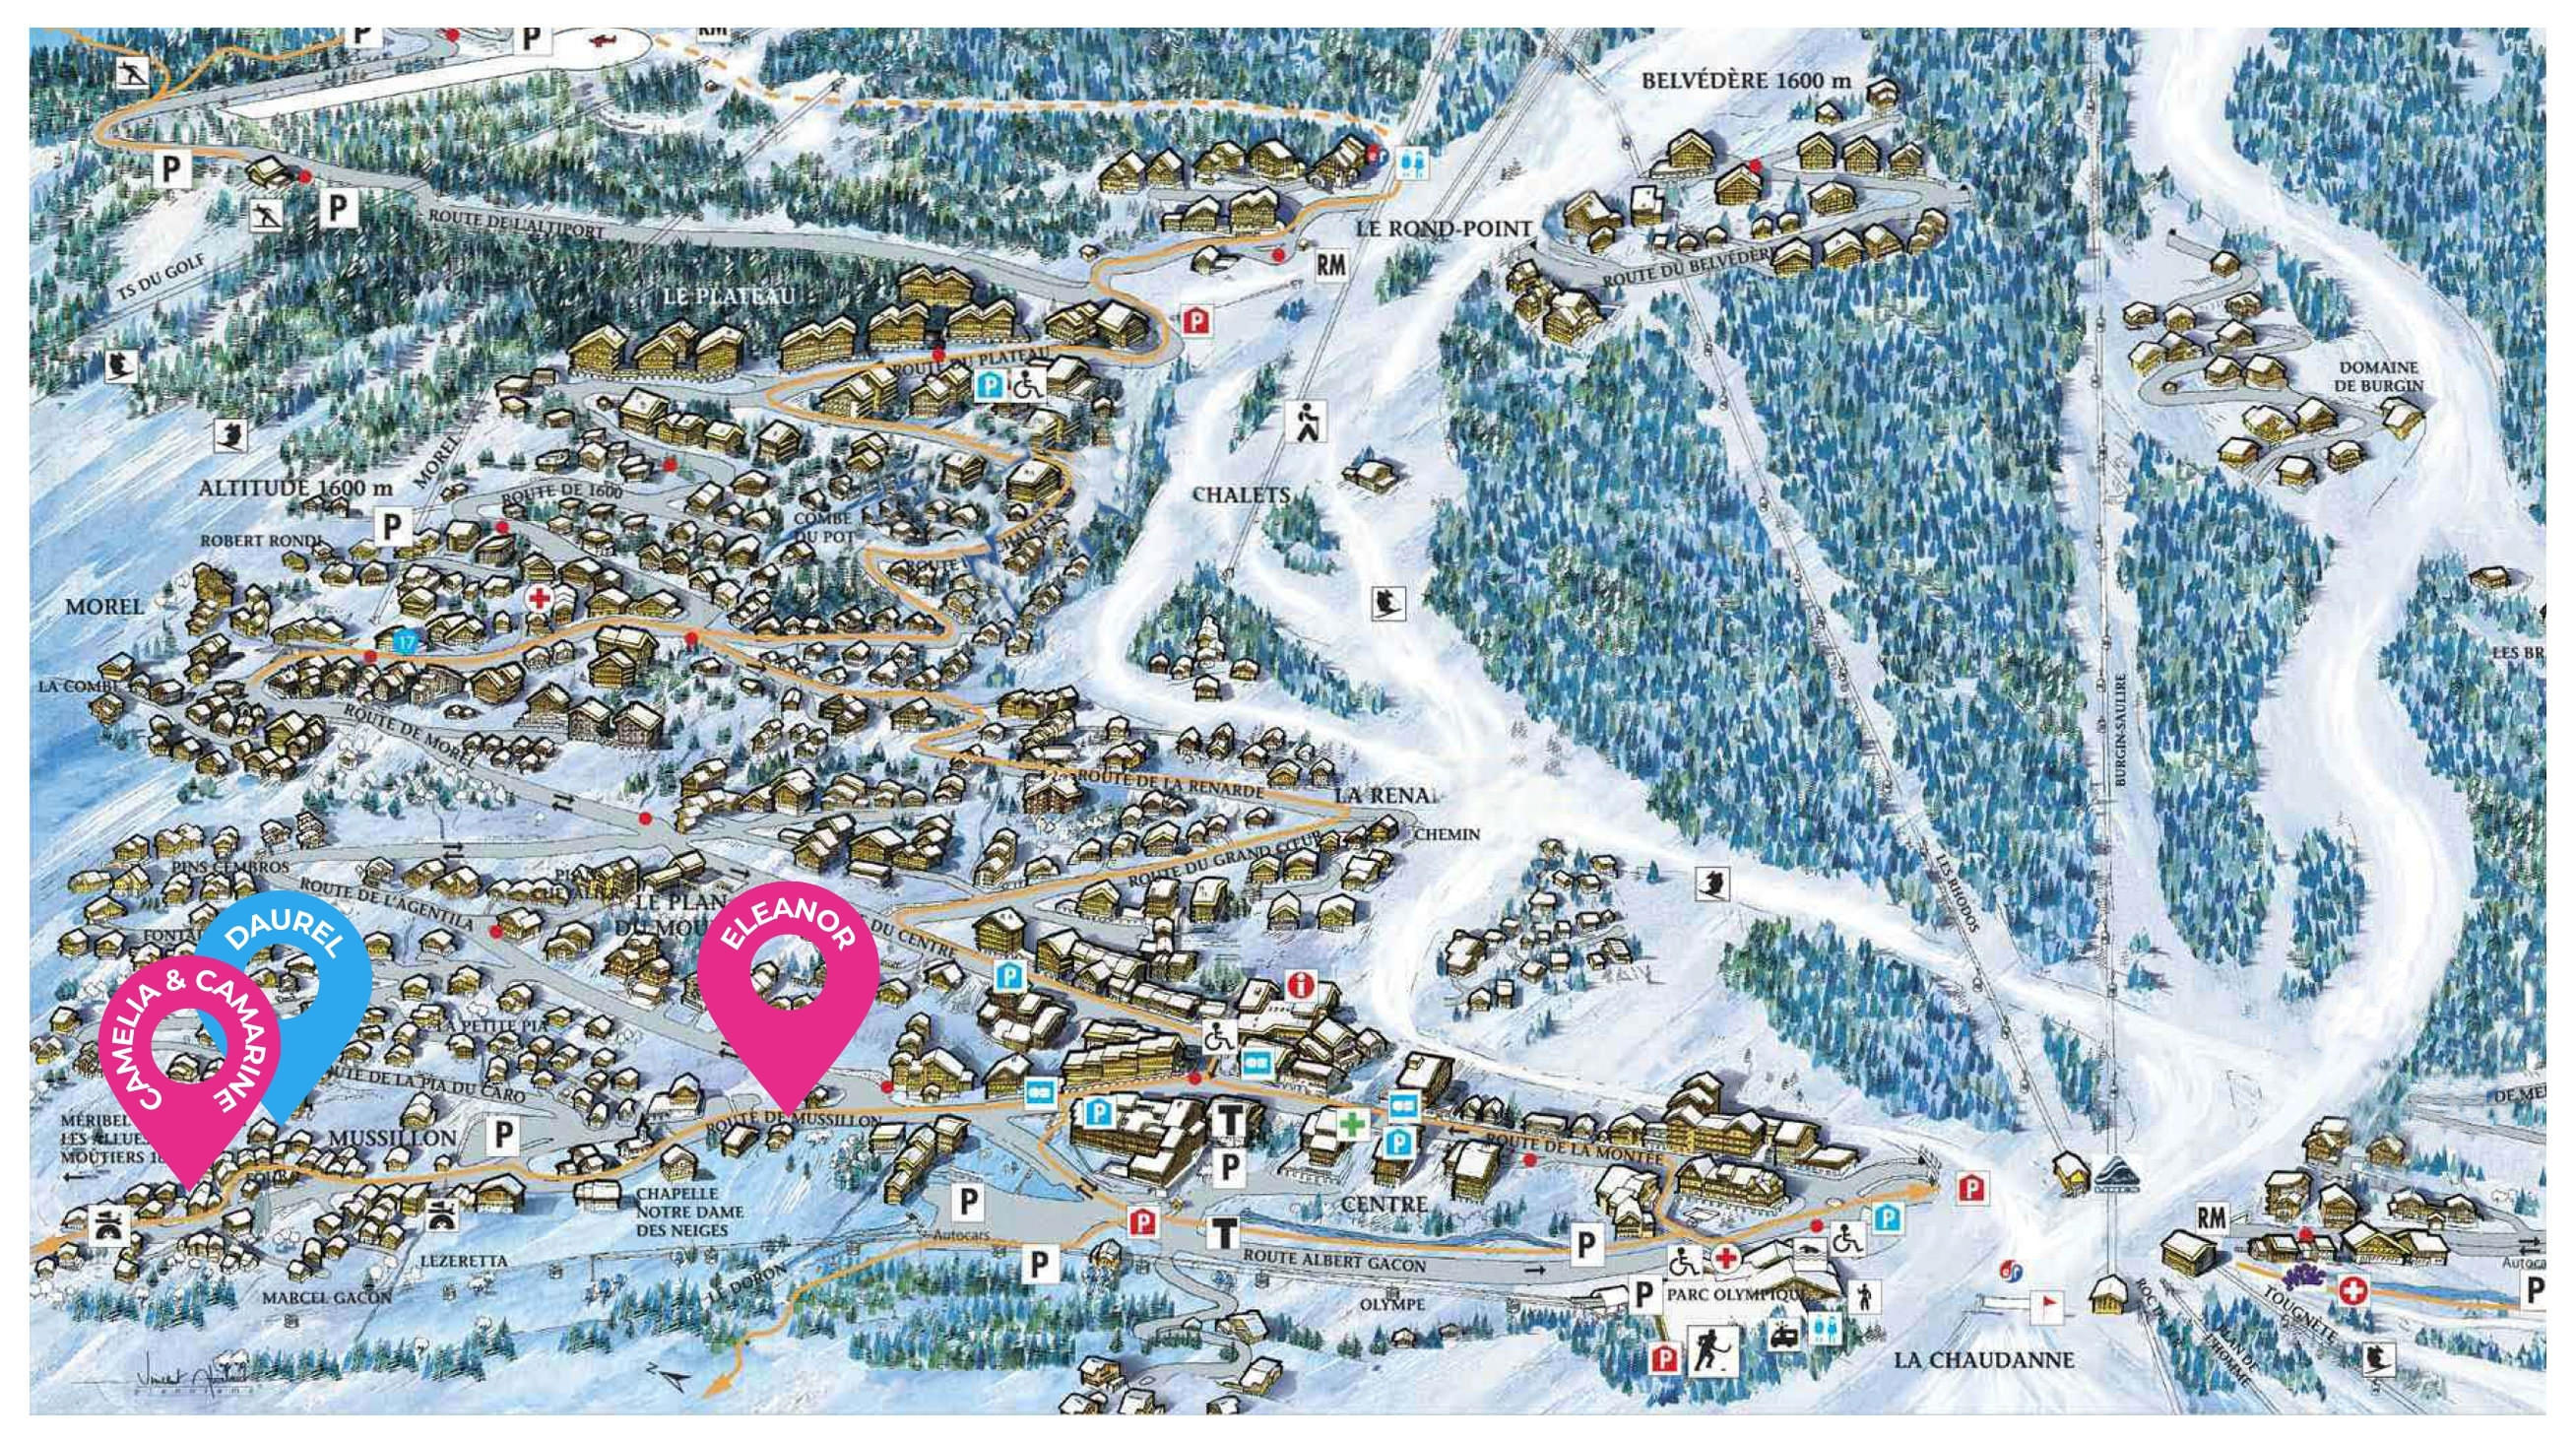 map of new chalets i meribel